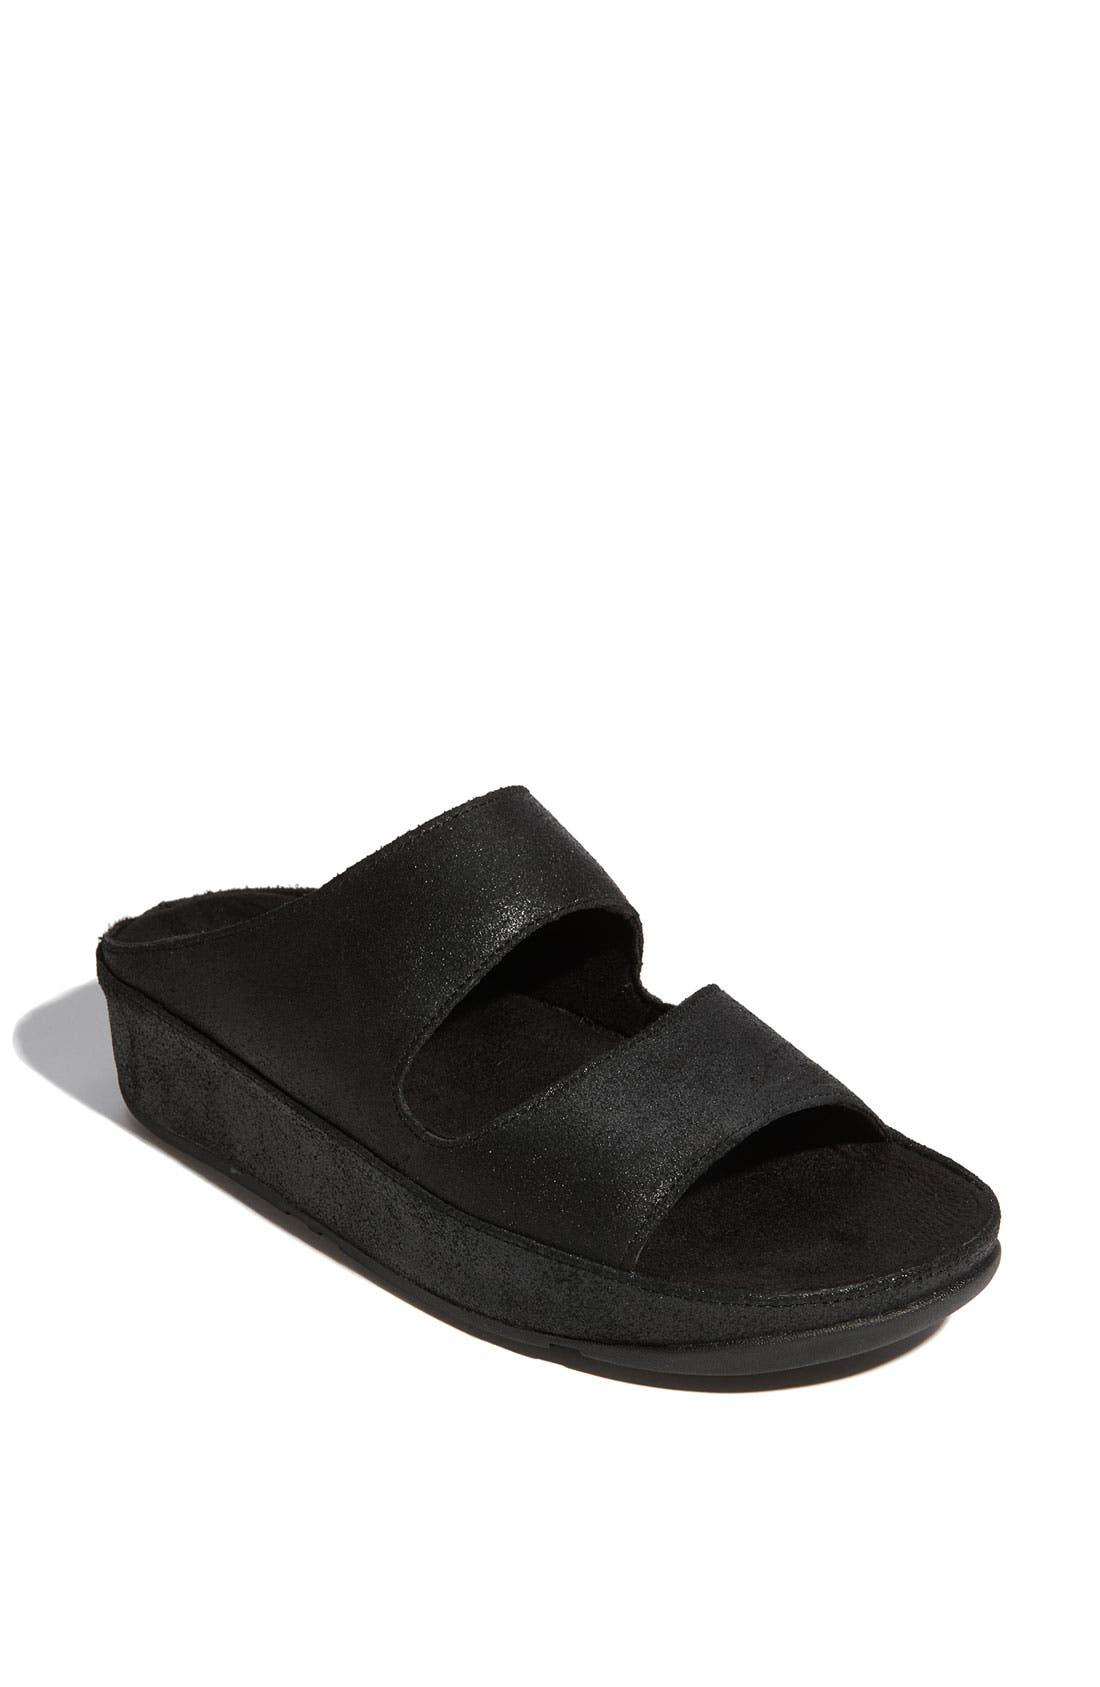 Main Image - FitFlop 'Lolla Crackle' Sandal